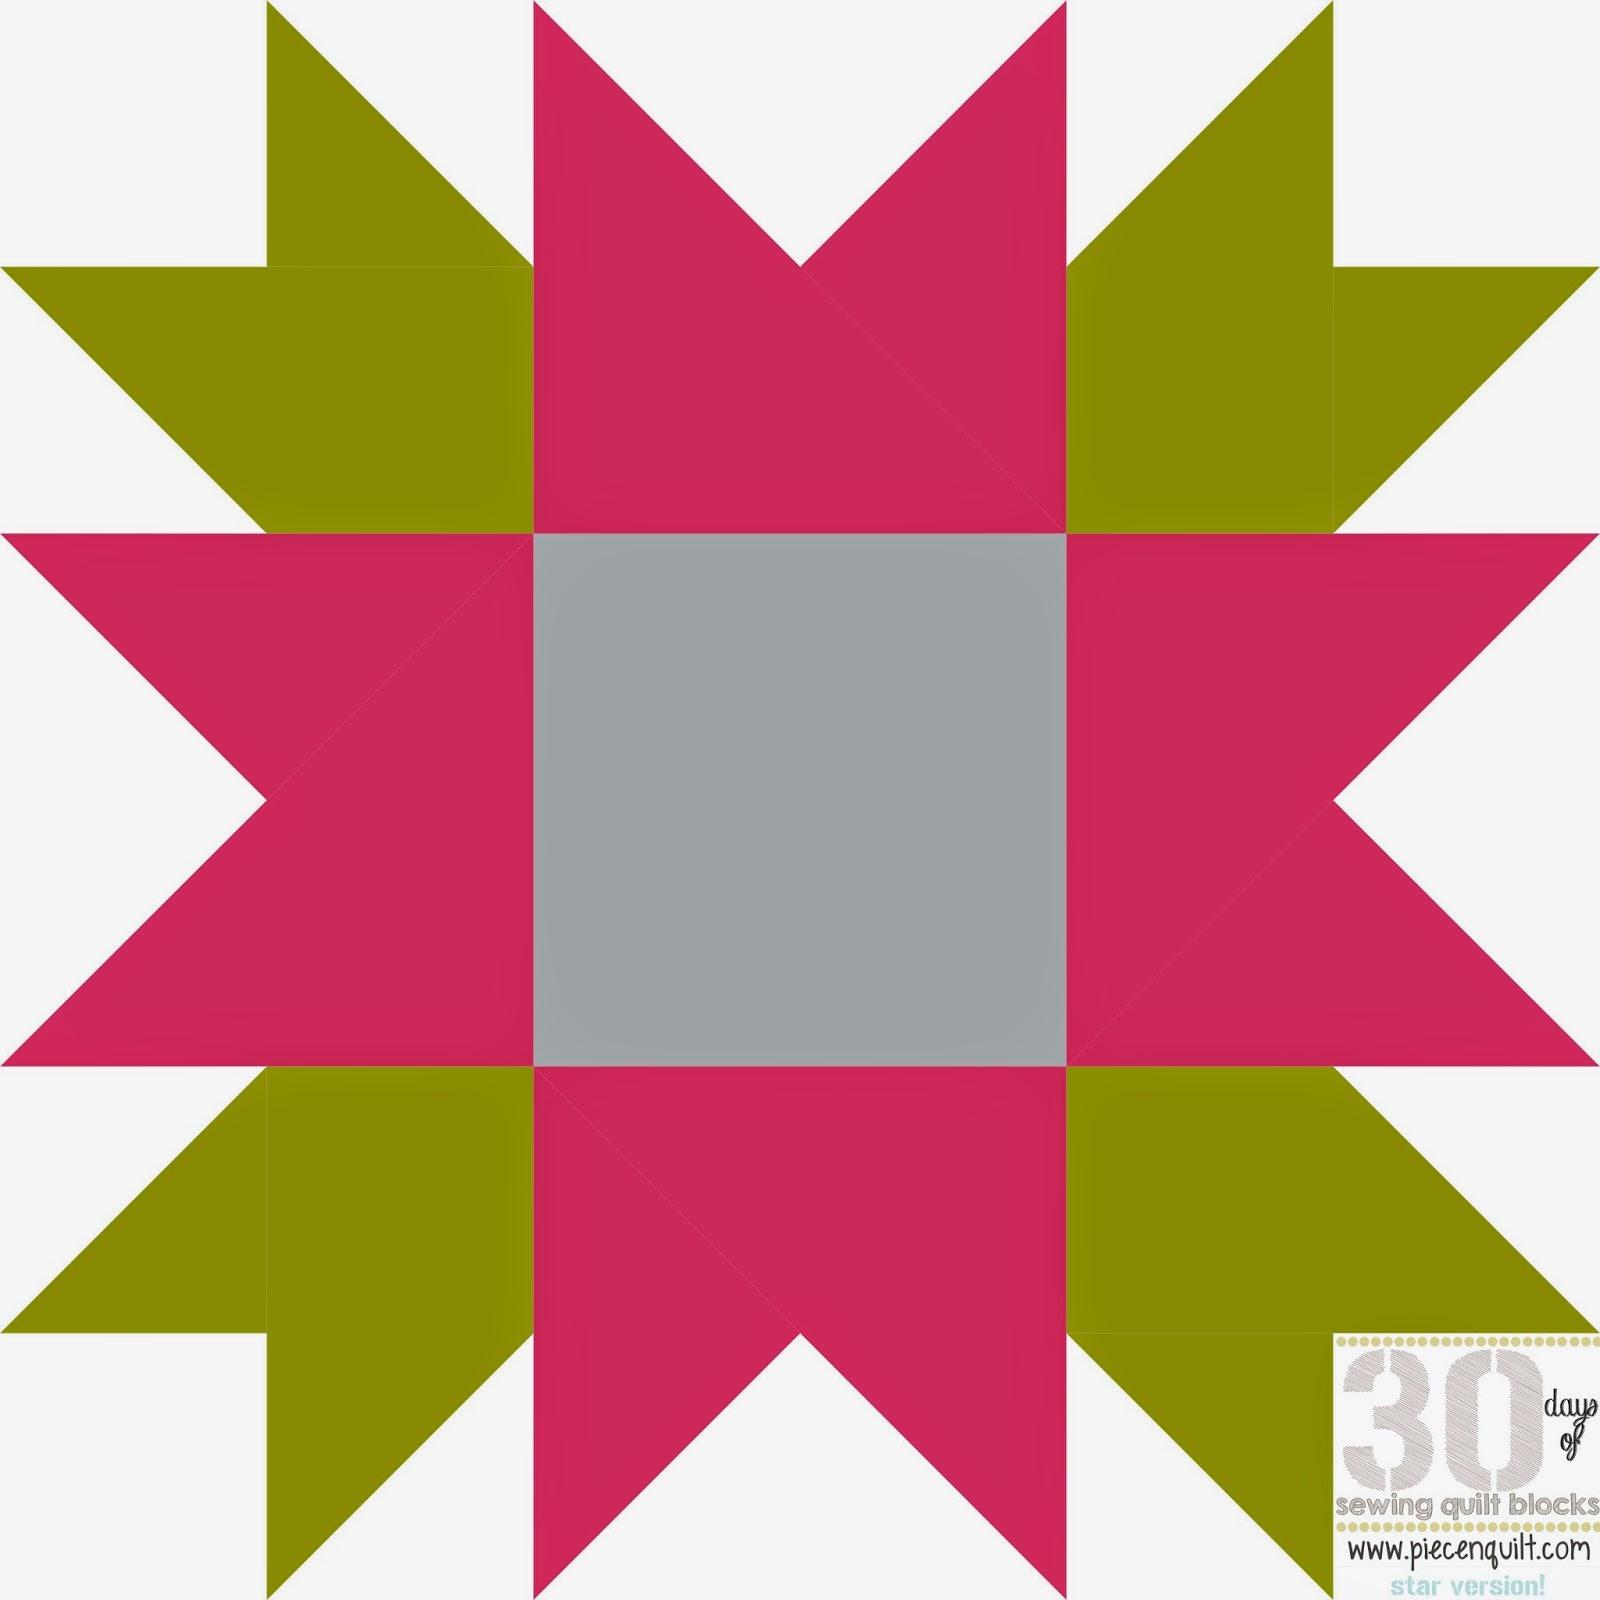 Piece N Quilt: How to: Flower Star Quilt Block - 30 Days of Sewing ... : star flower quilt block pattern - Adamdwight.com